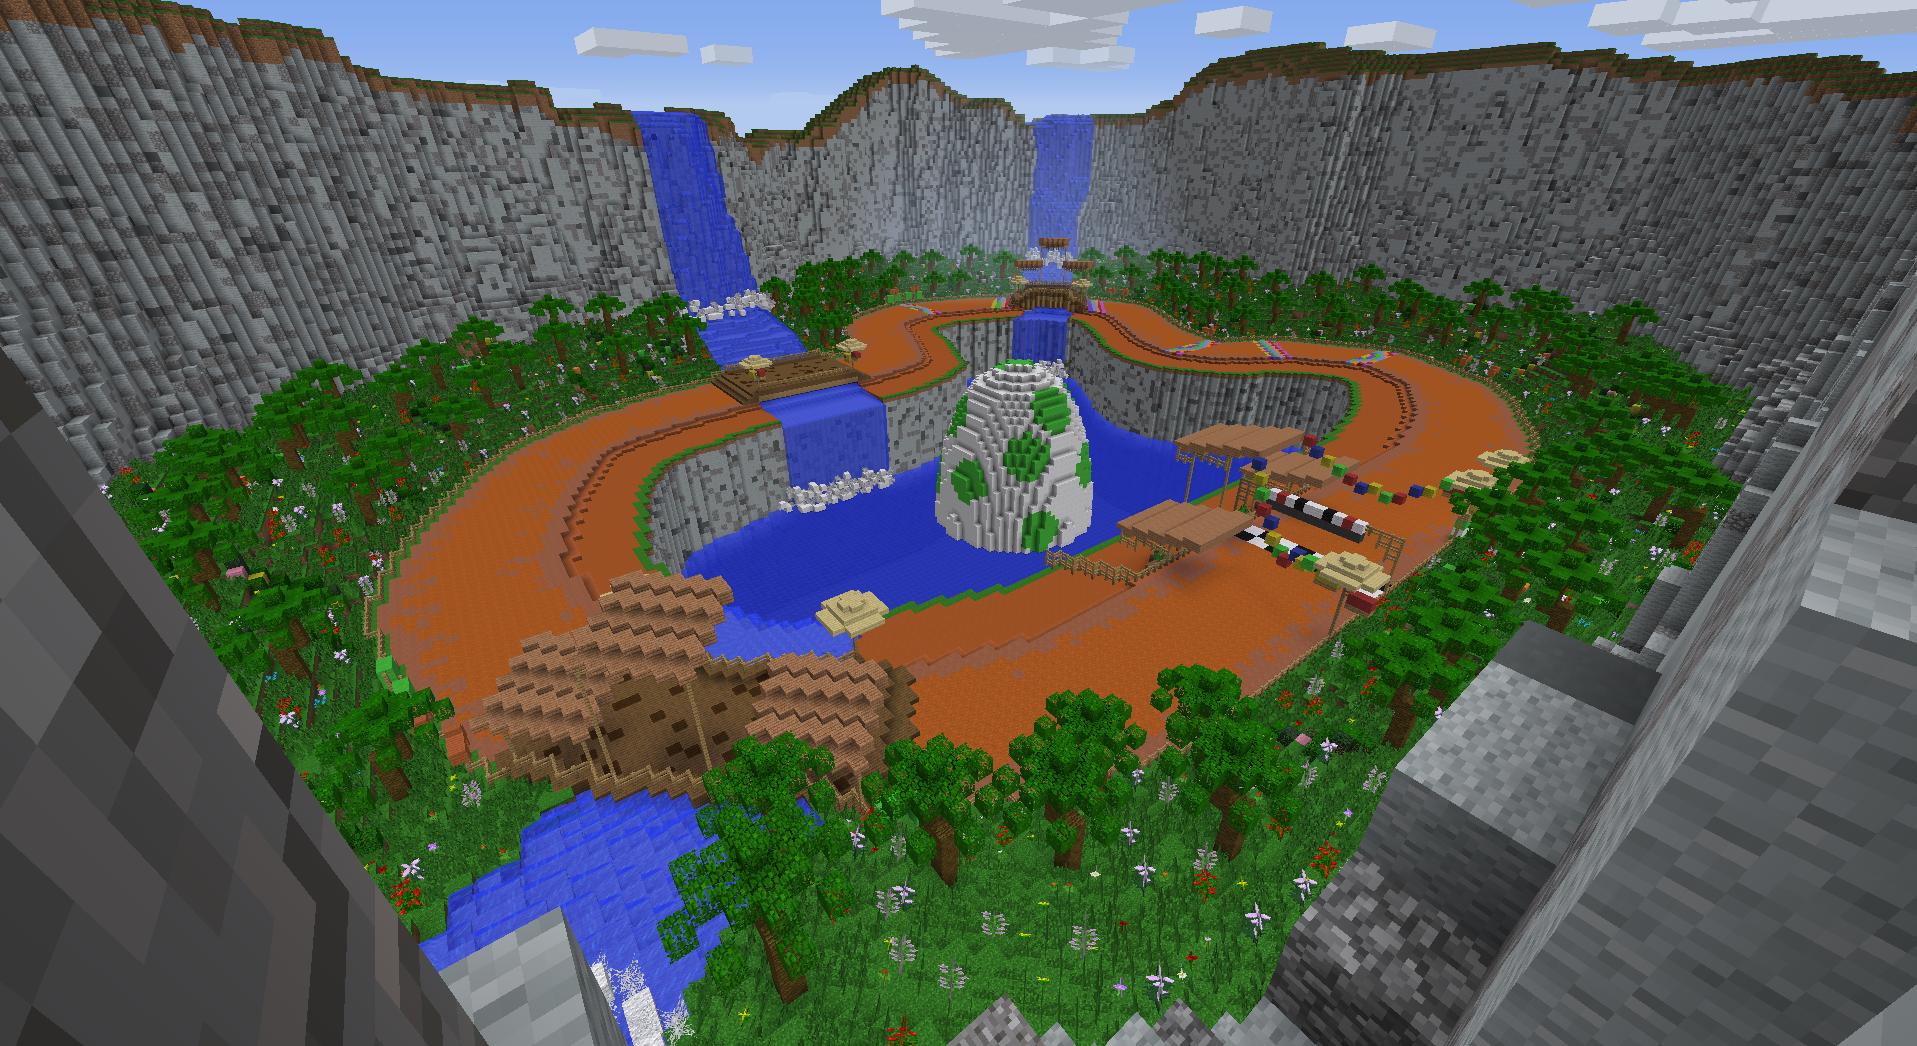 Yoshi Takes The Lead In This Minecraft Mario Kart Track Minecrafters - Descargar skins para minecraft pe yoshi